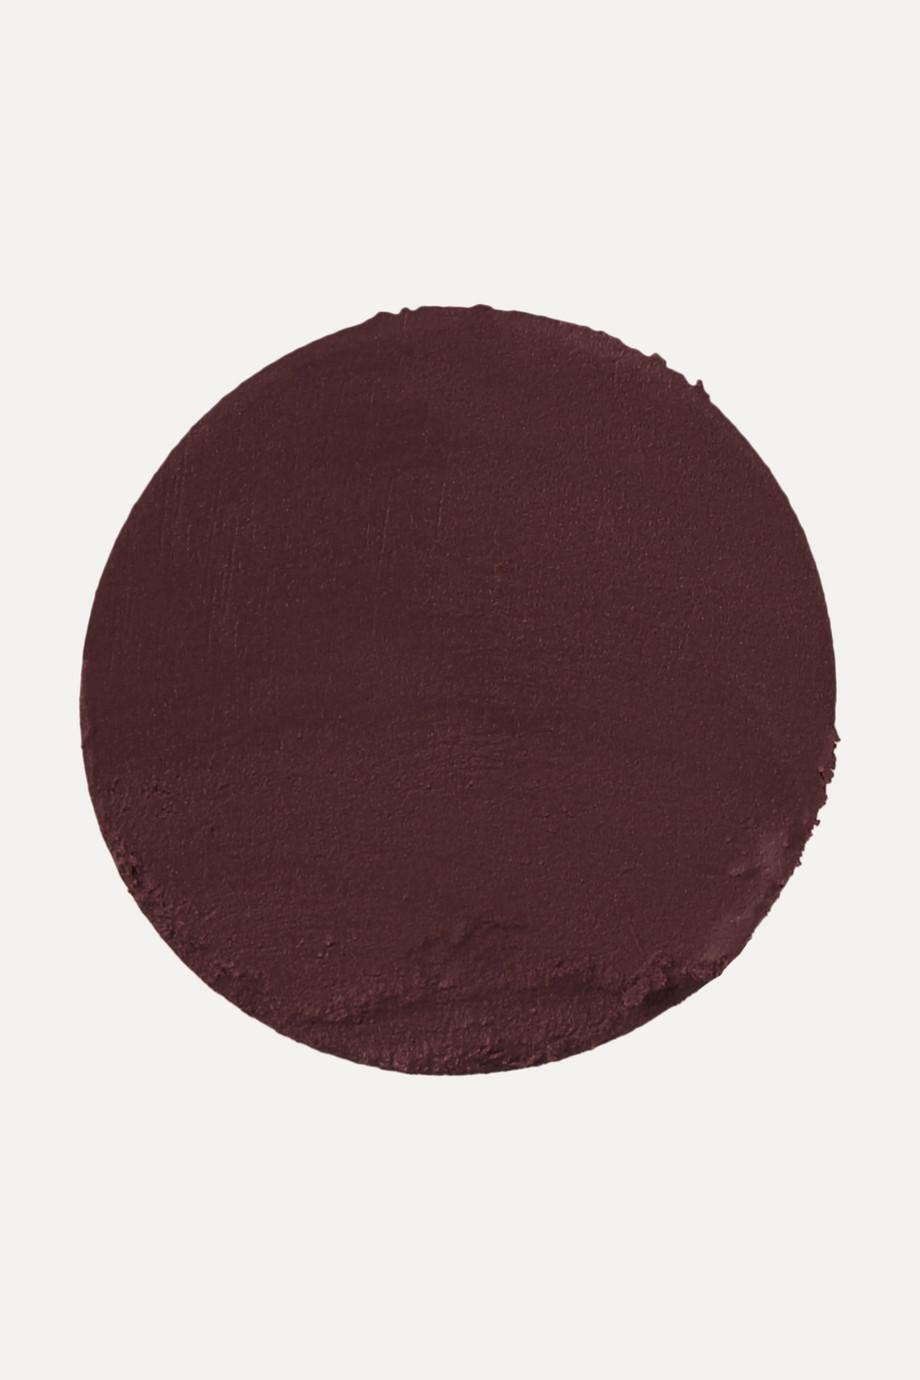 Pat McGrath Labs MatteTrance Lipstick - McMenamy